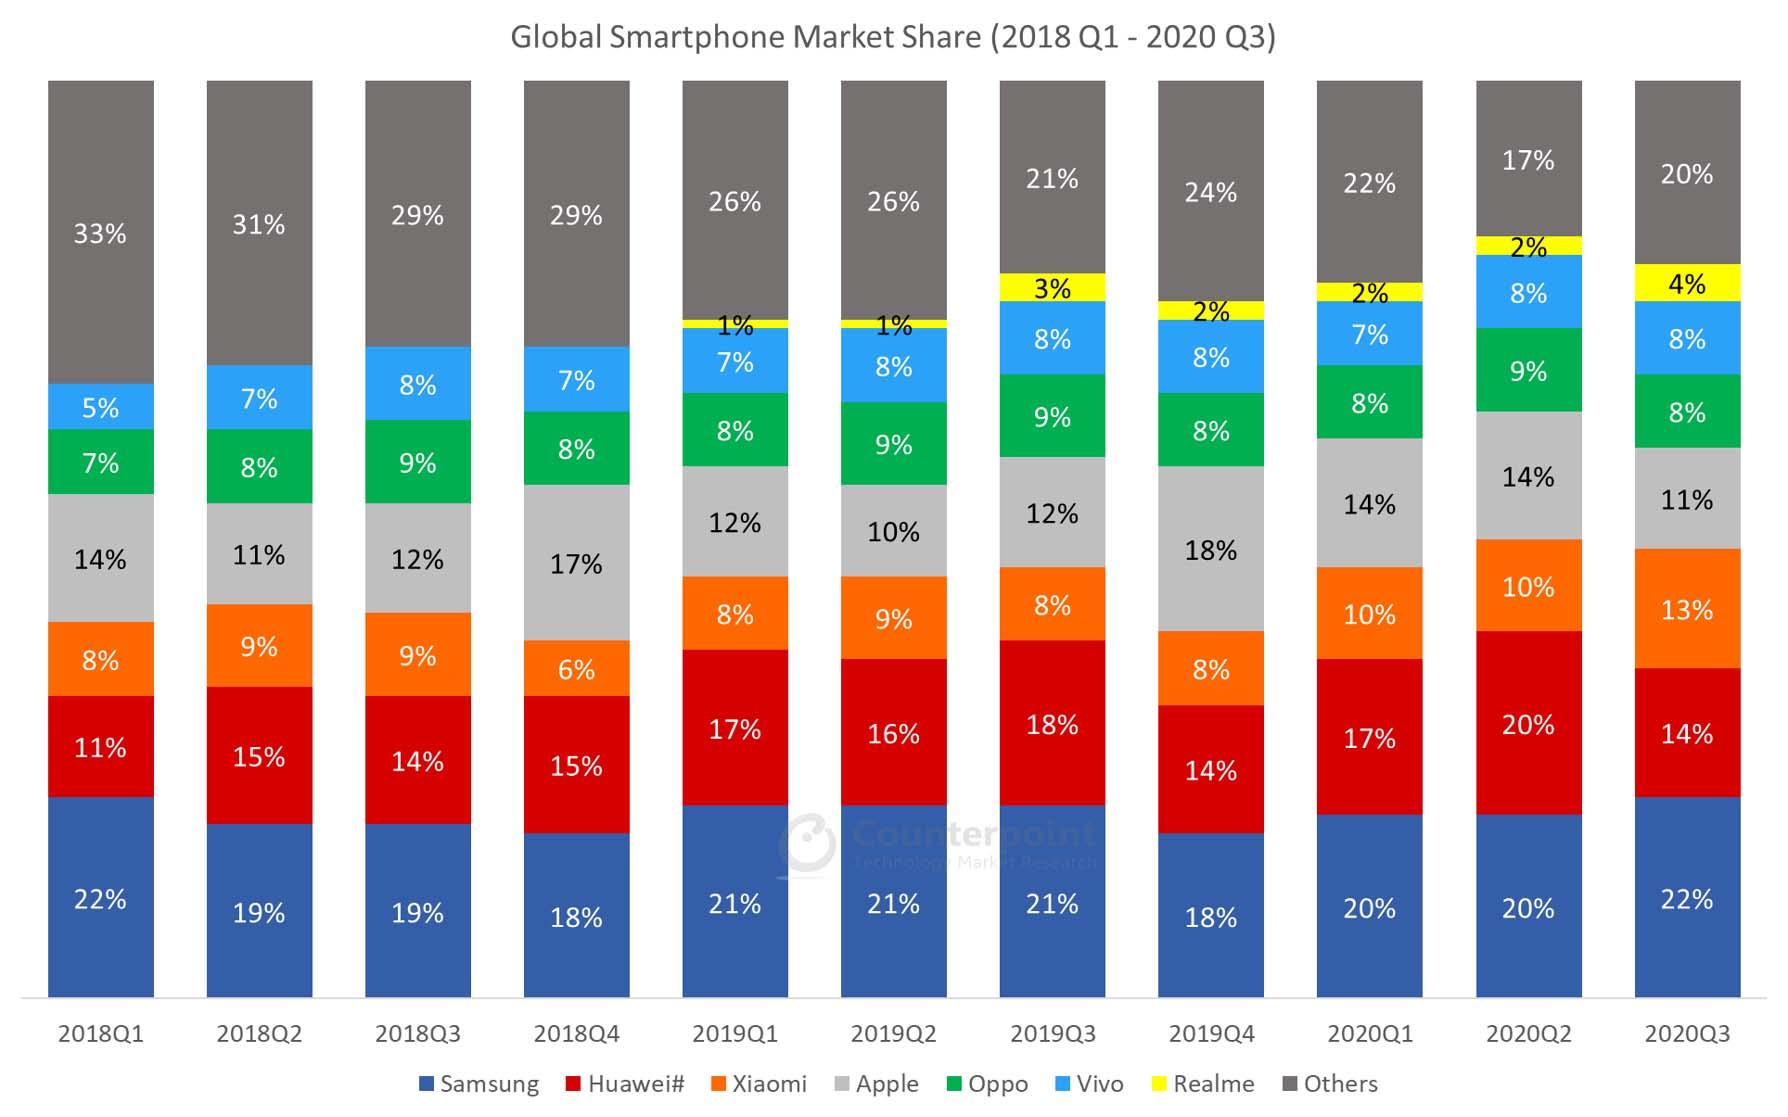 Counterpoint Global Smartphone Quarterly Market Data 2018Q1-2020Q3